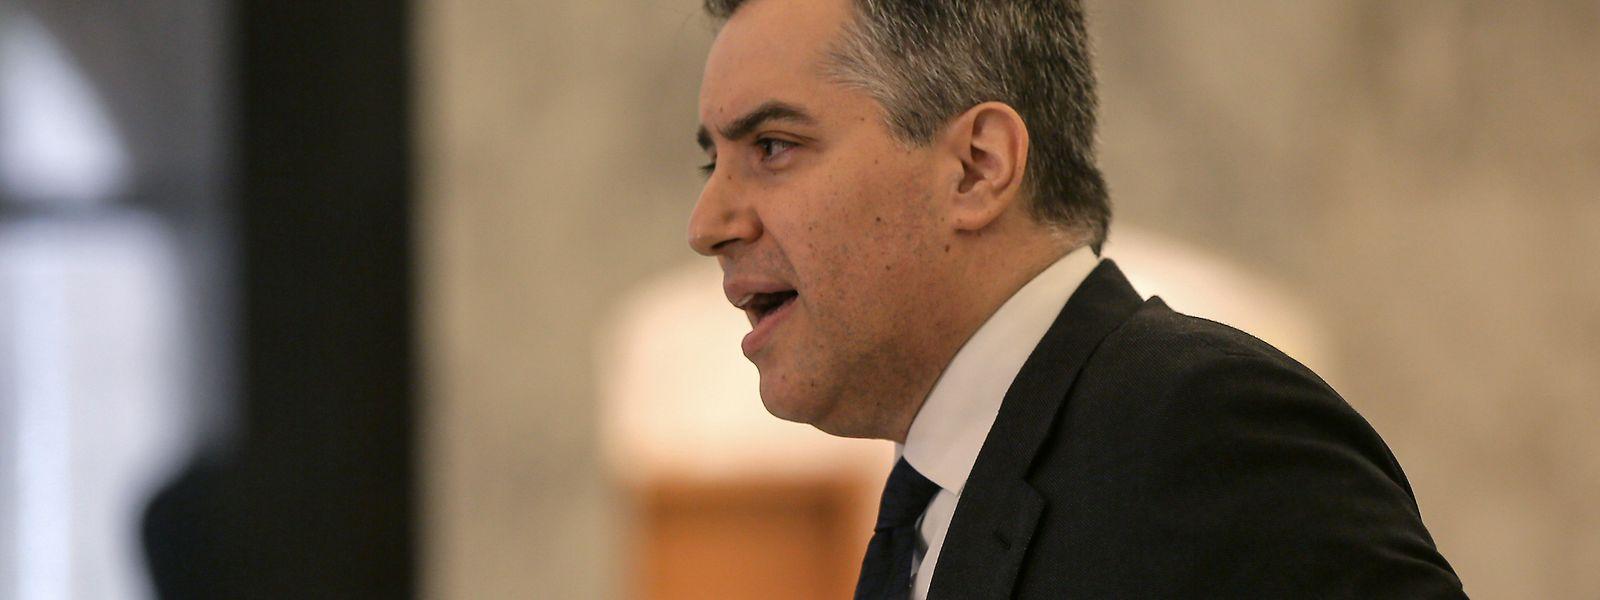 Mustafa Adib, Libanons designierter Ministerpräsident, kündigte am Samstag seinen Rücktritt an.